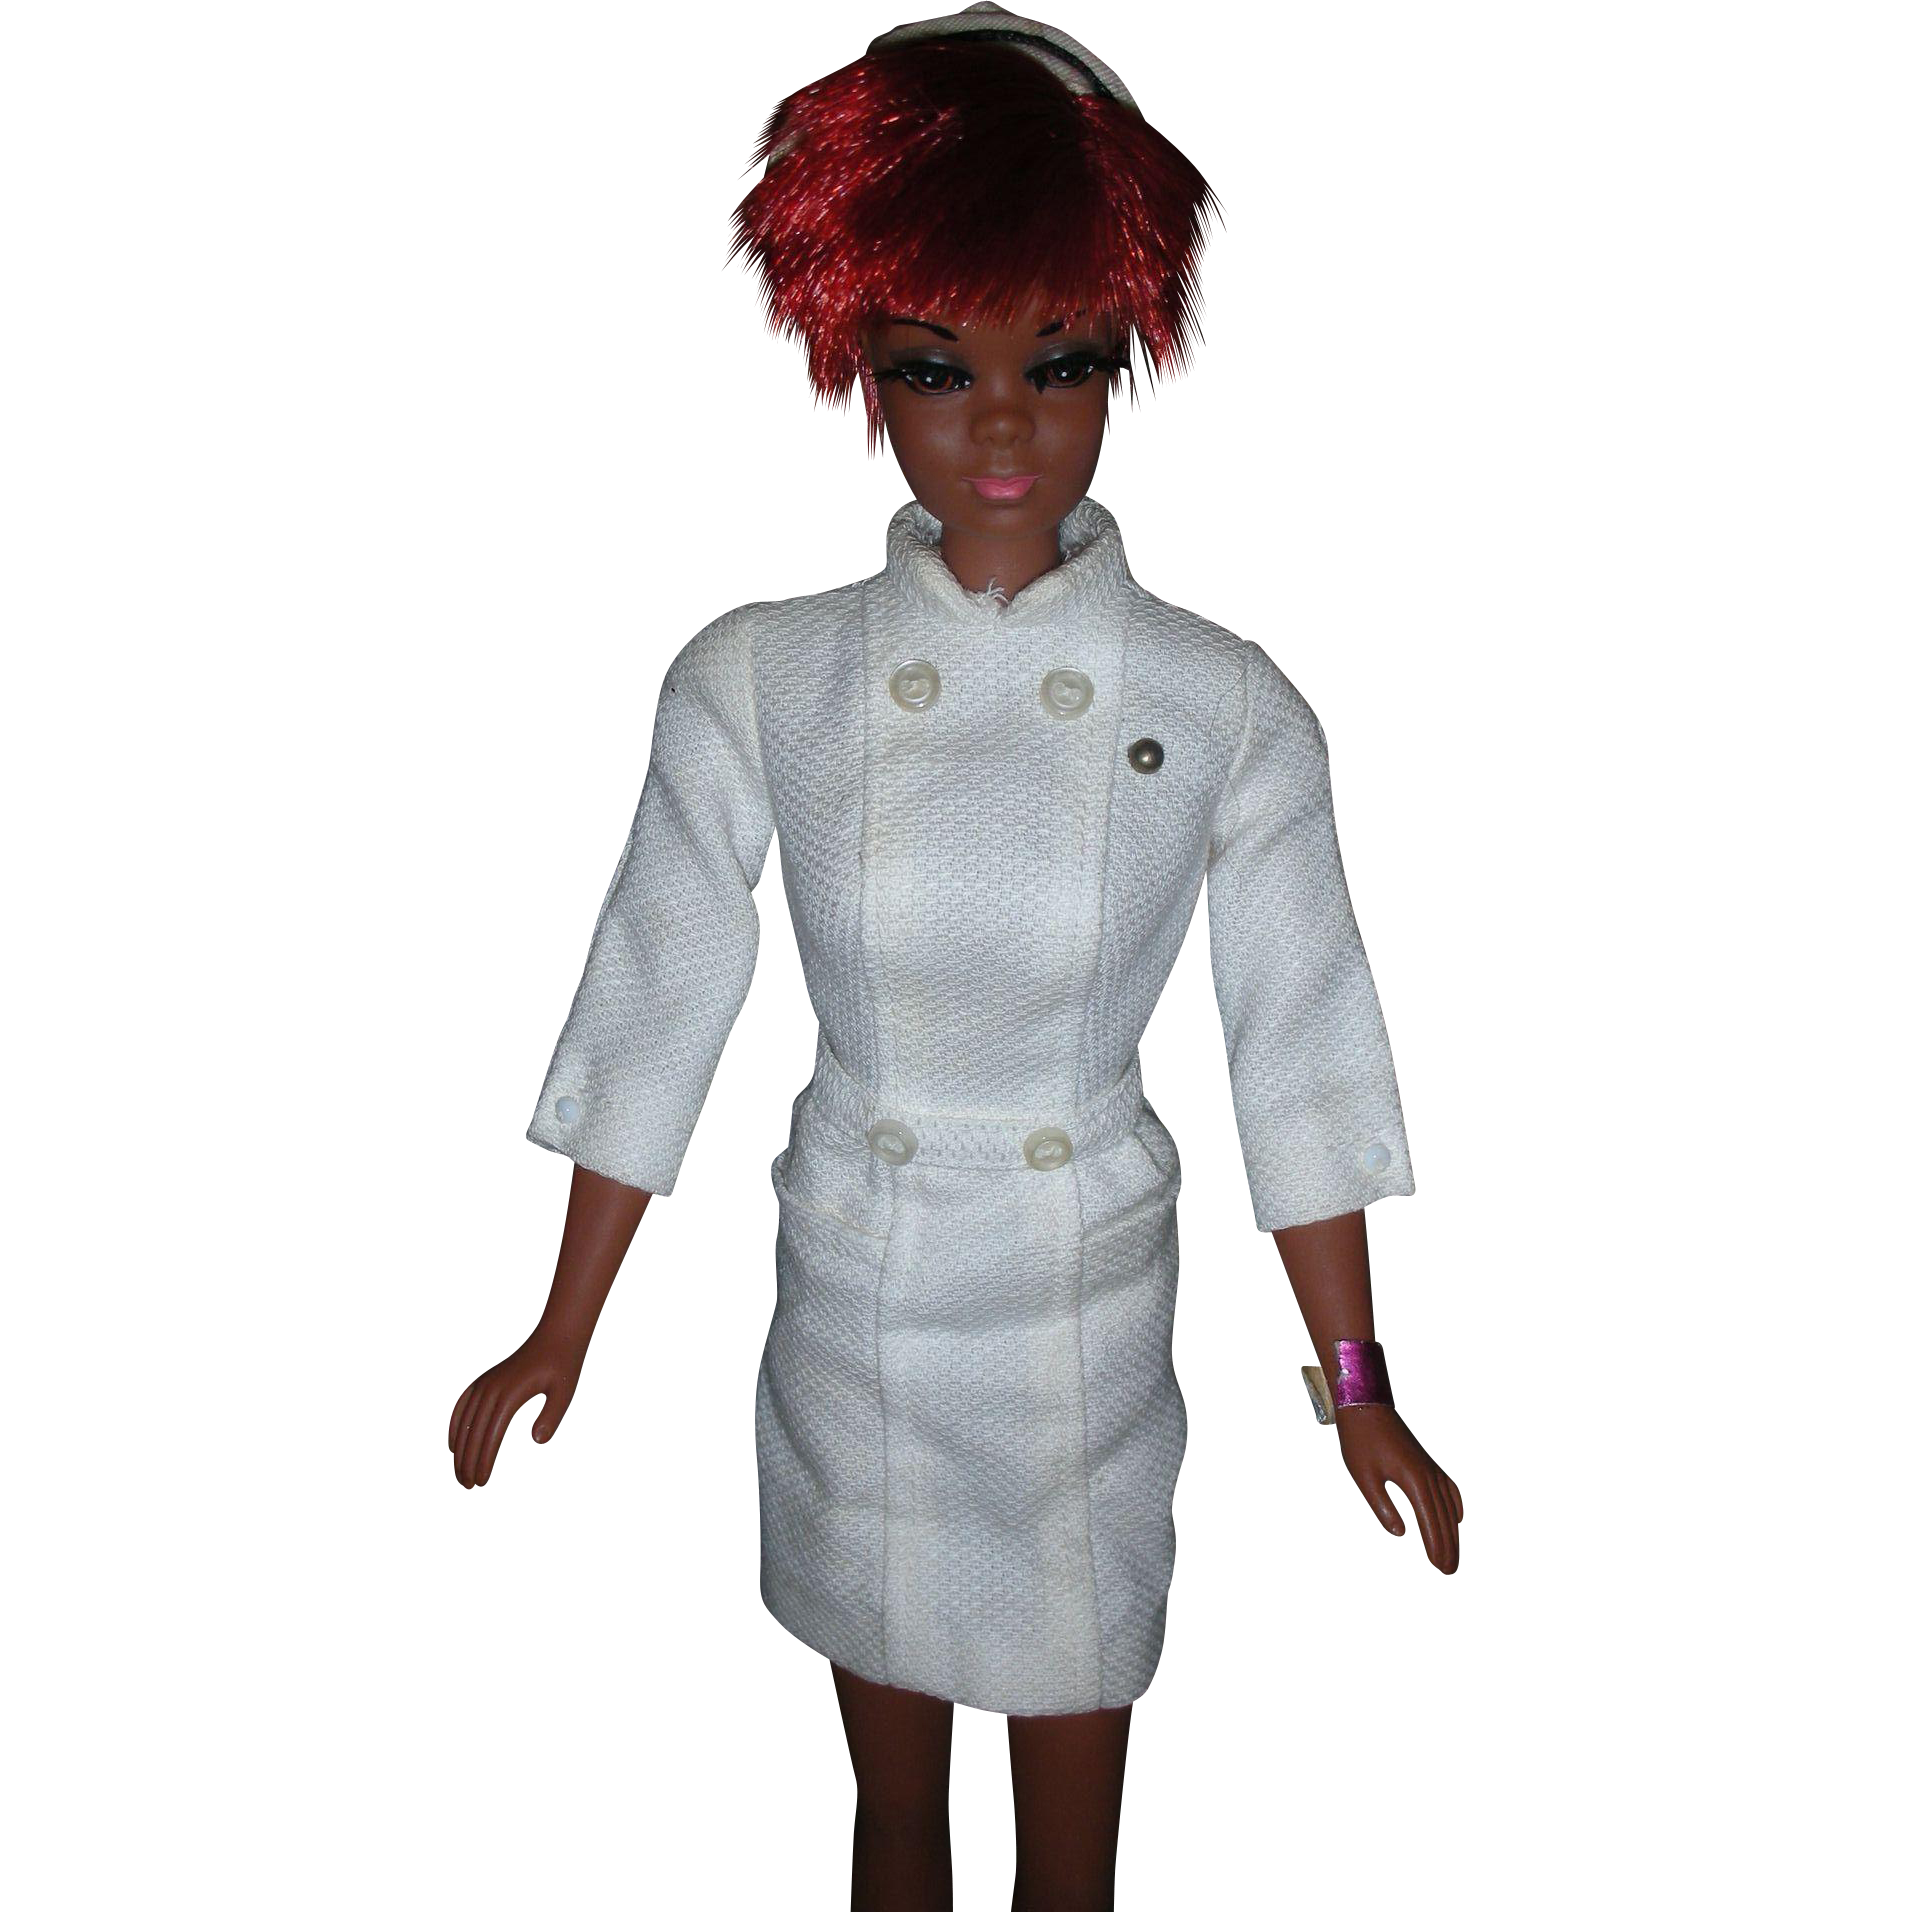 Vintage Mod Era Nurse Julia Doll Diahann Carrol Barbie Family 1960's